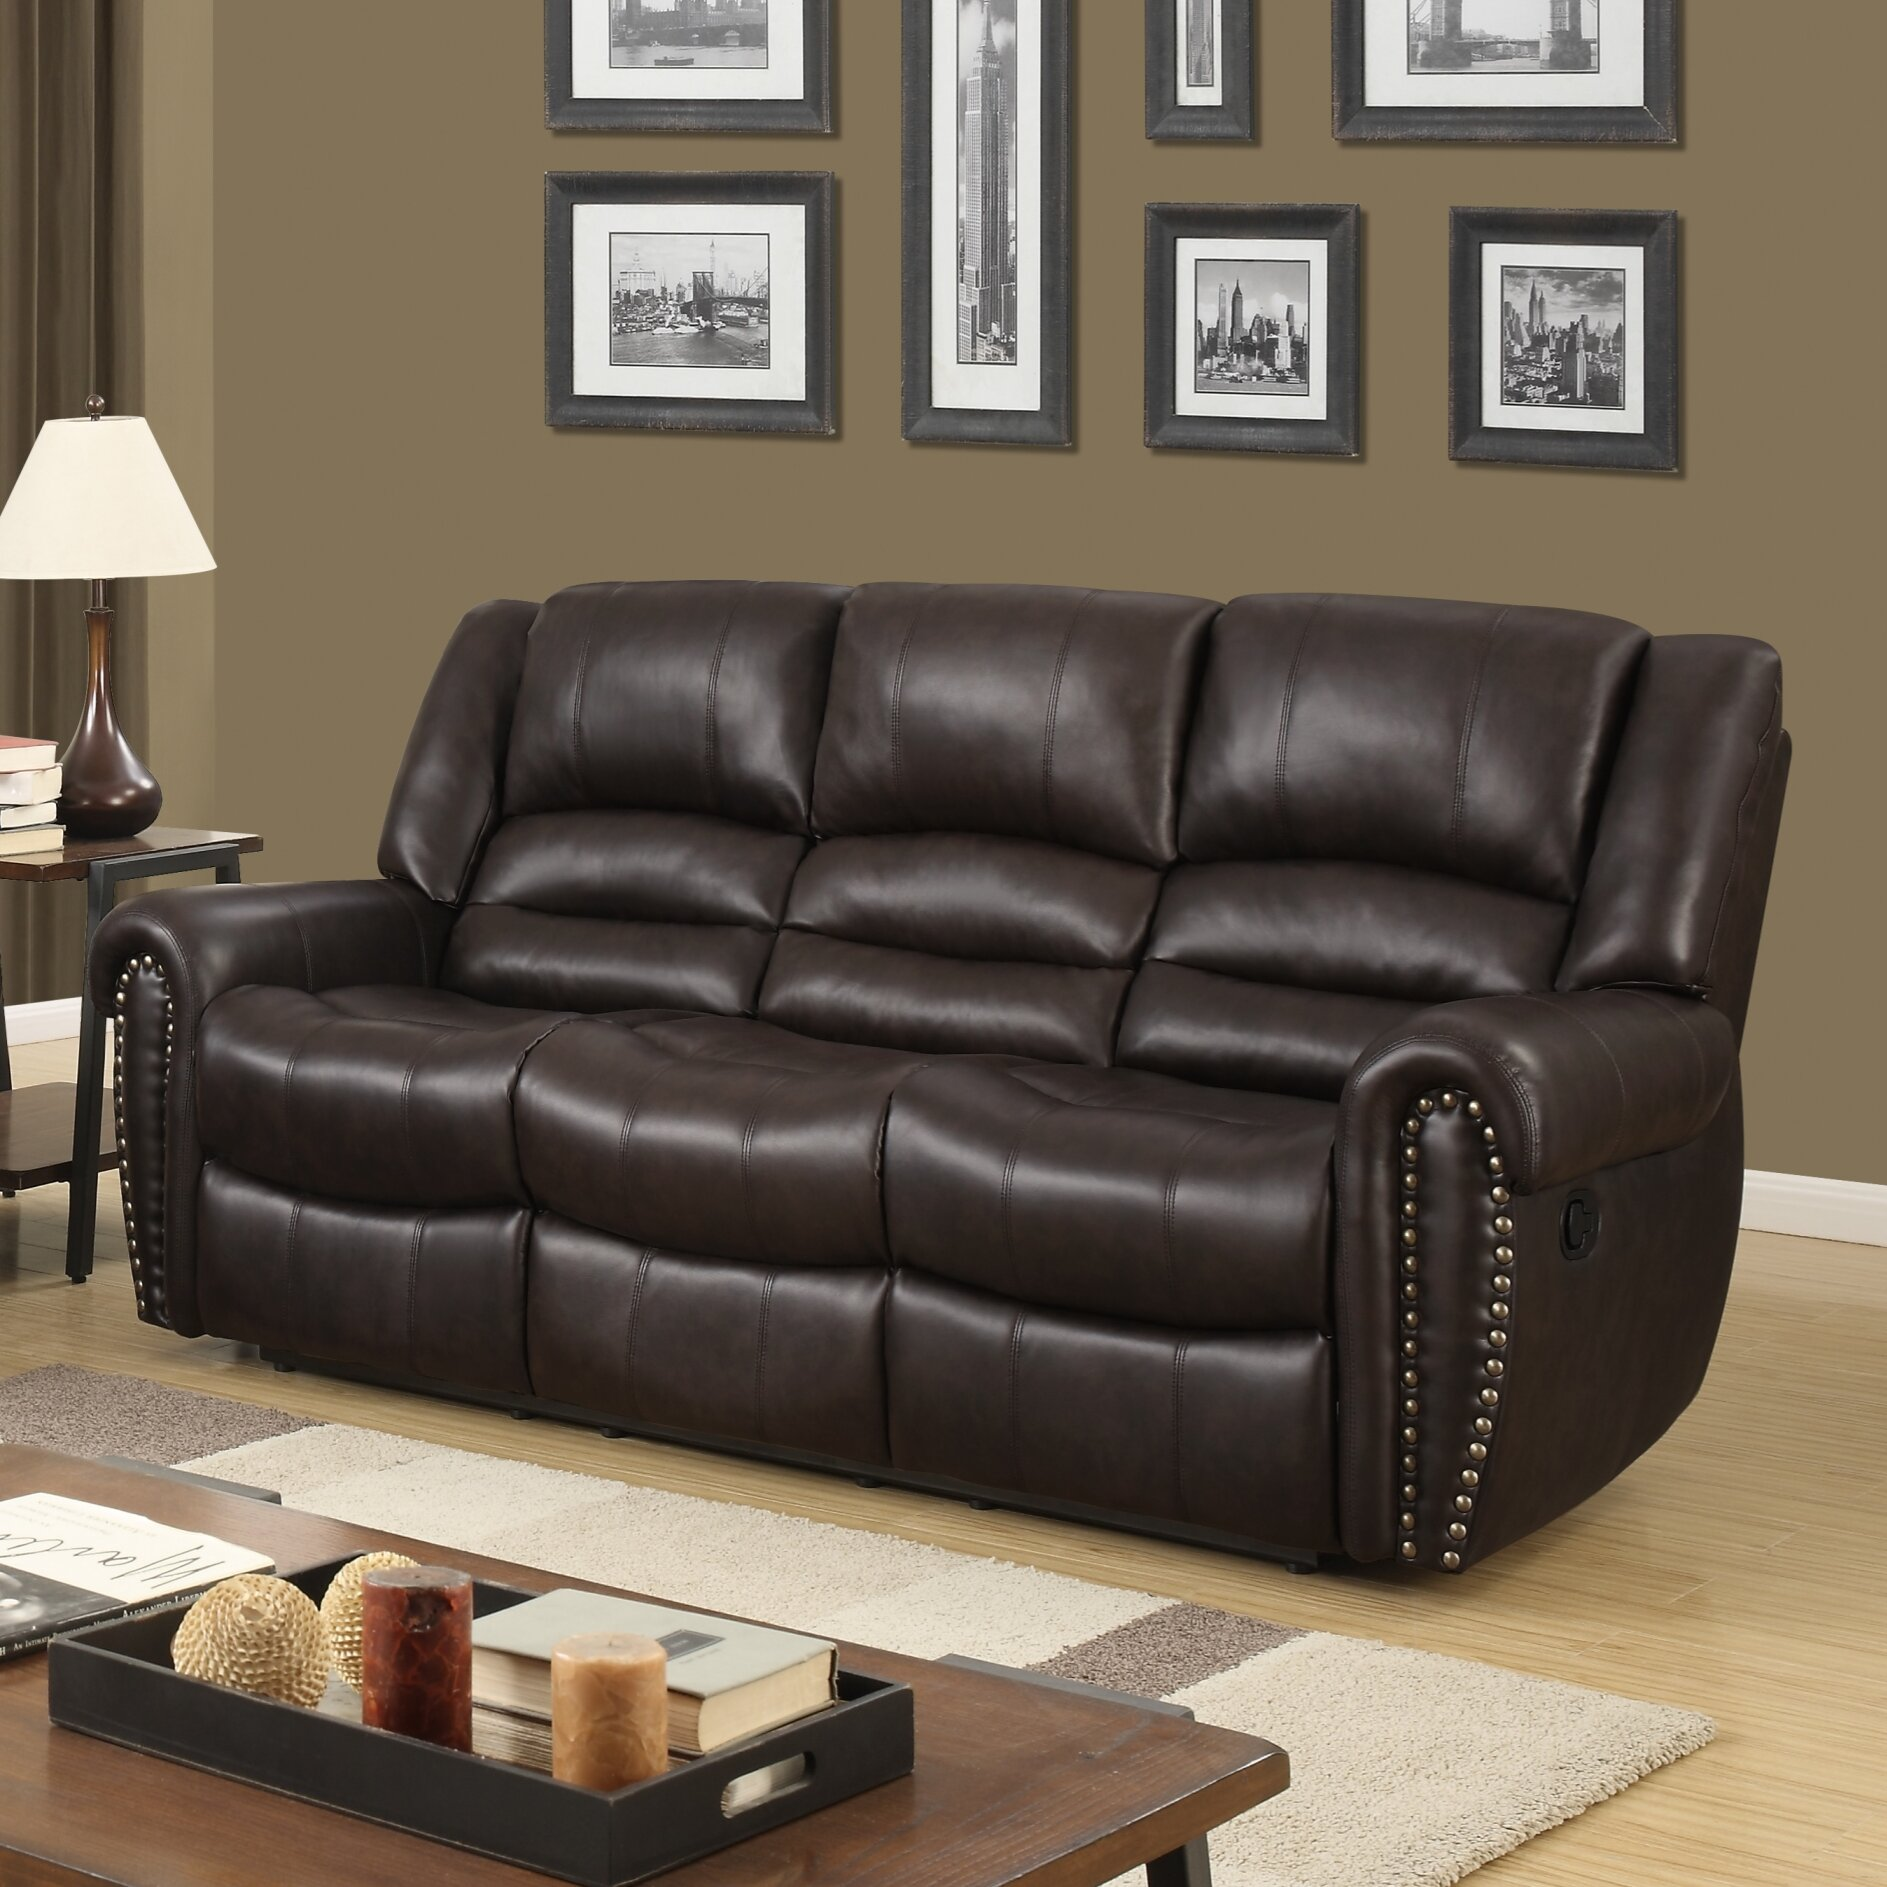 3 Reclining Sectional Sofa